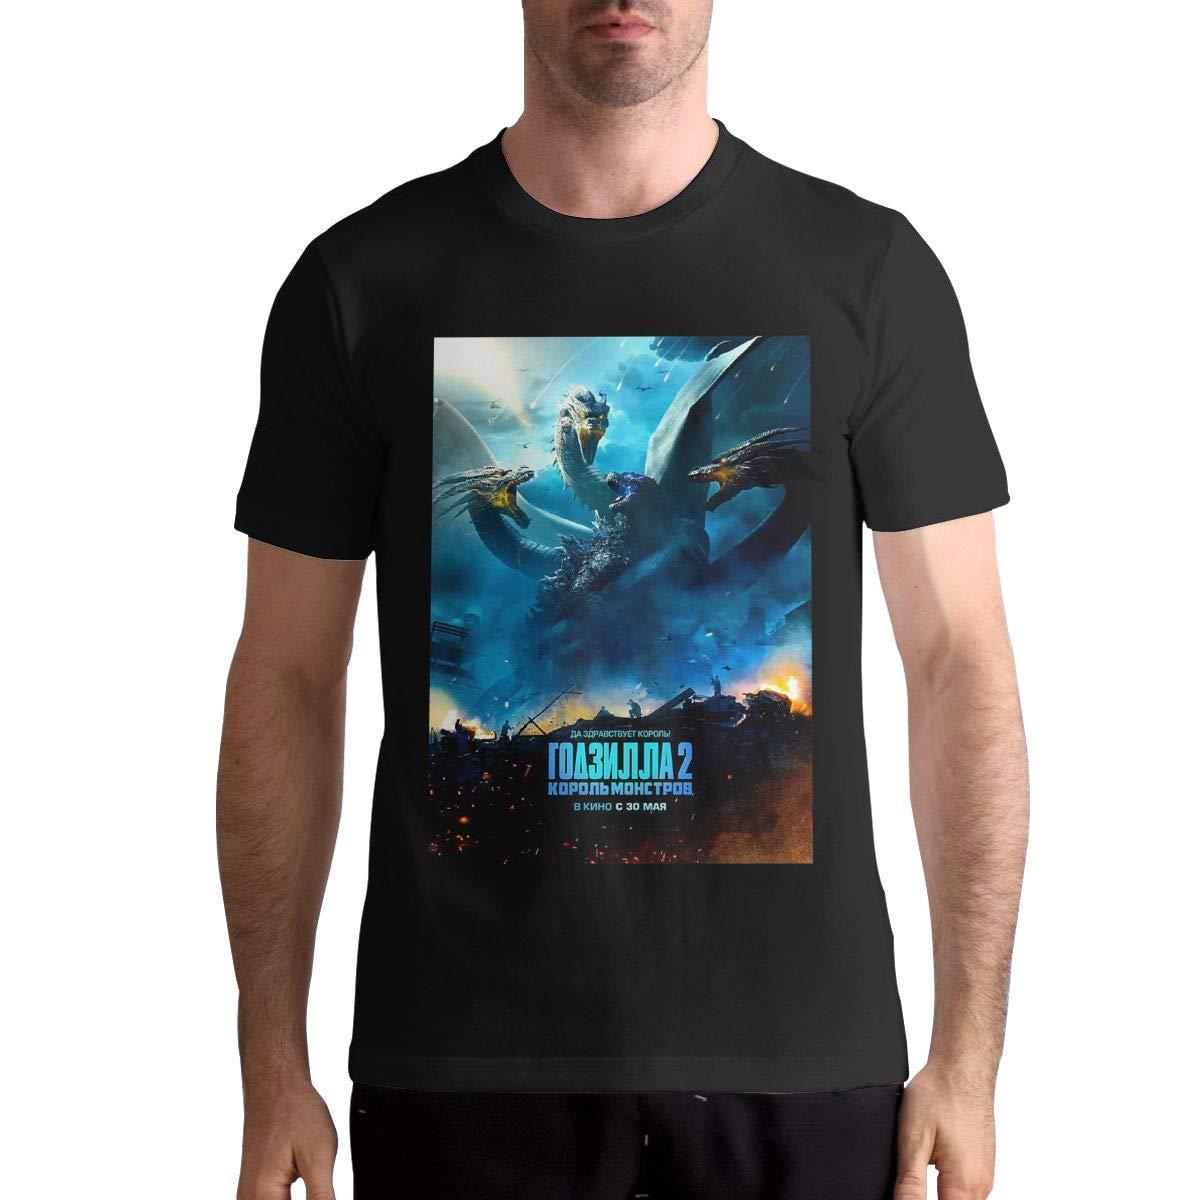 Godzilla King Of The Monsters T Shirt S T Shirt Fashion Sports Tops Round Neck Short Sleev